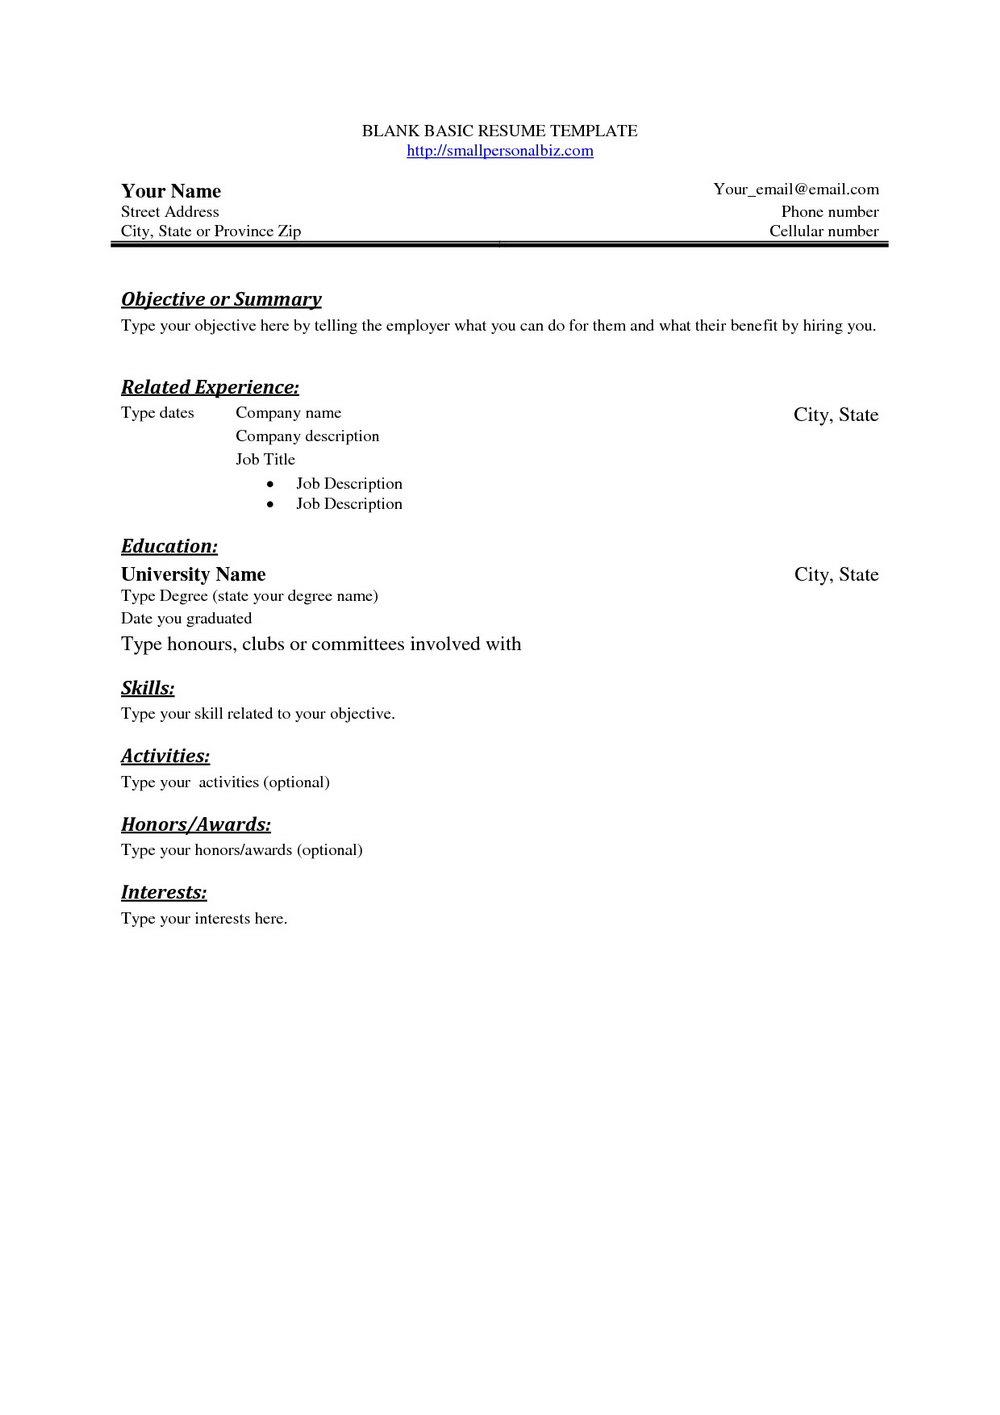 Blank Resume Templates Pdf